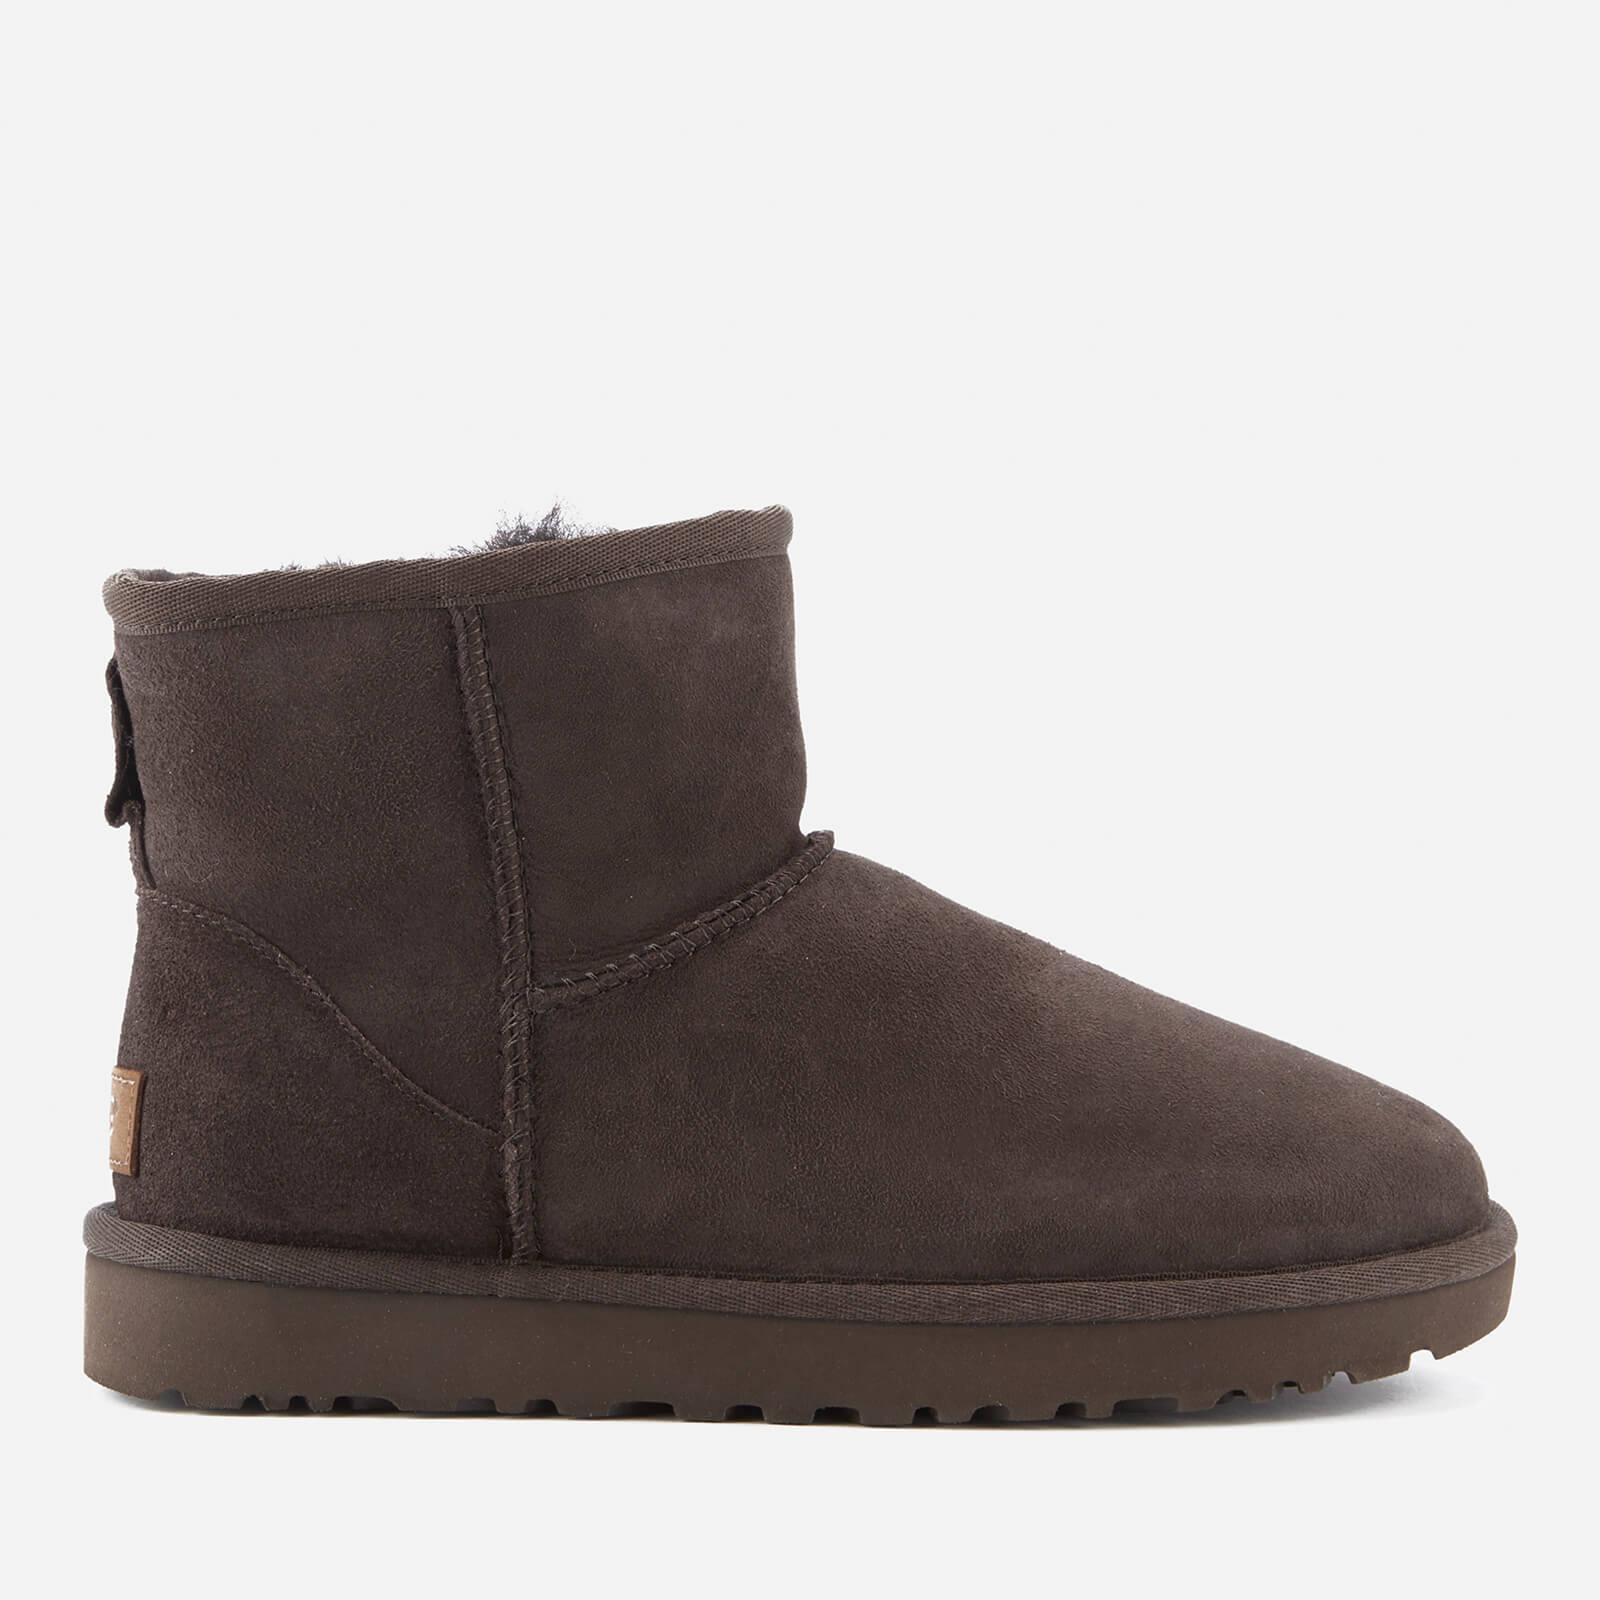 UGG Women's Classic Mini II Sheepskin Boots - Chocolate - UK 8